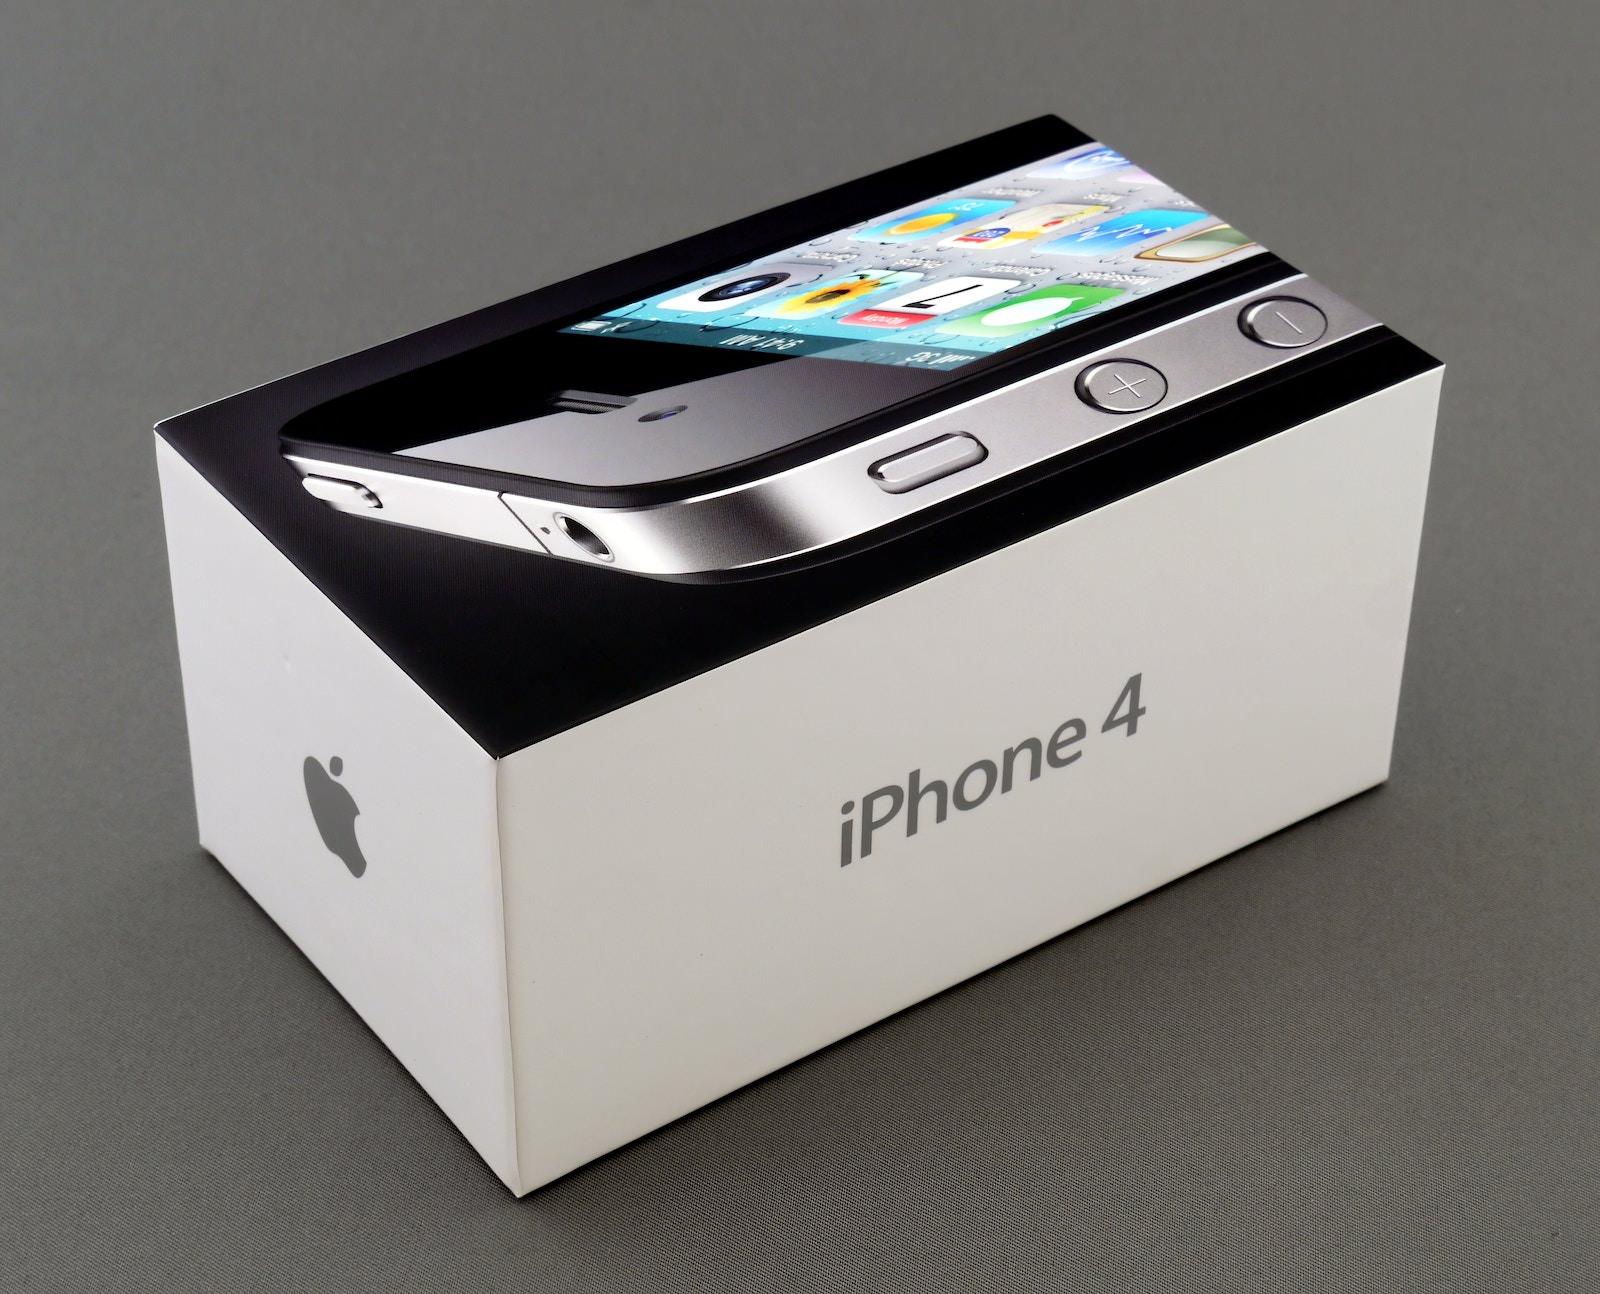 brett-jordan-H29Blq8NgFs-unsplash-iphone4.jpg